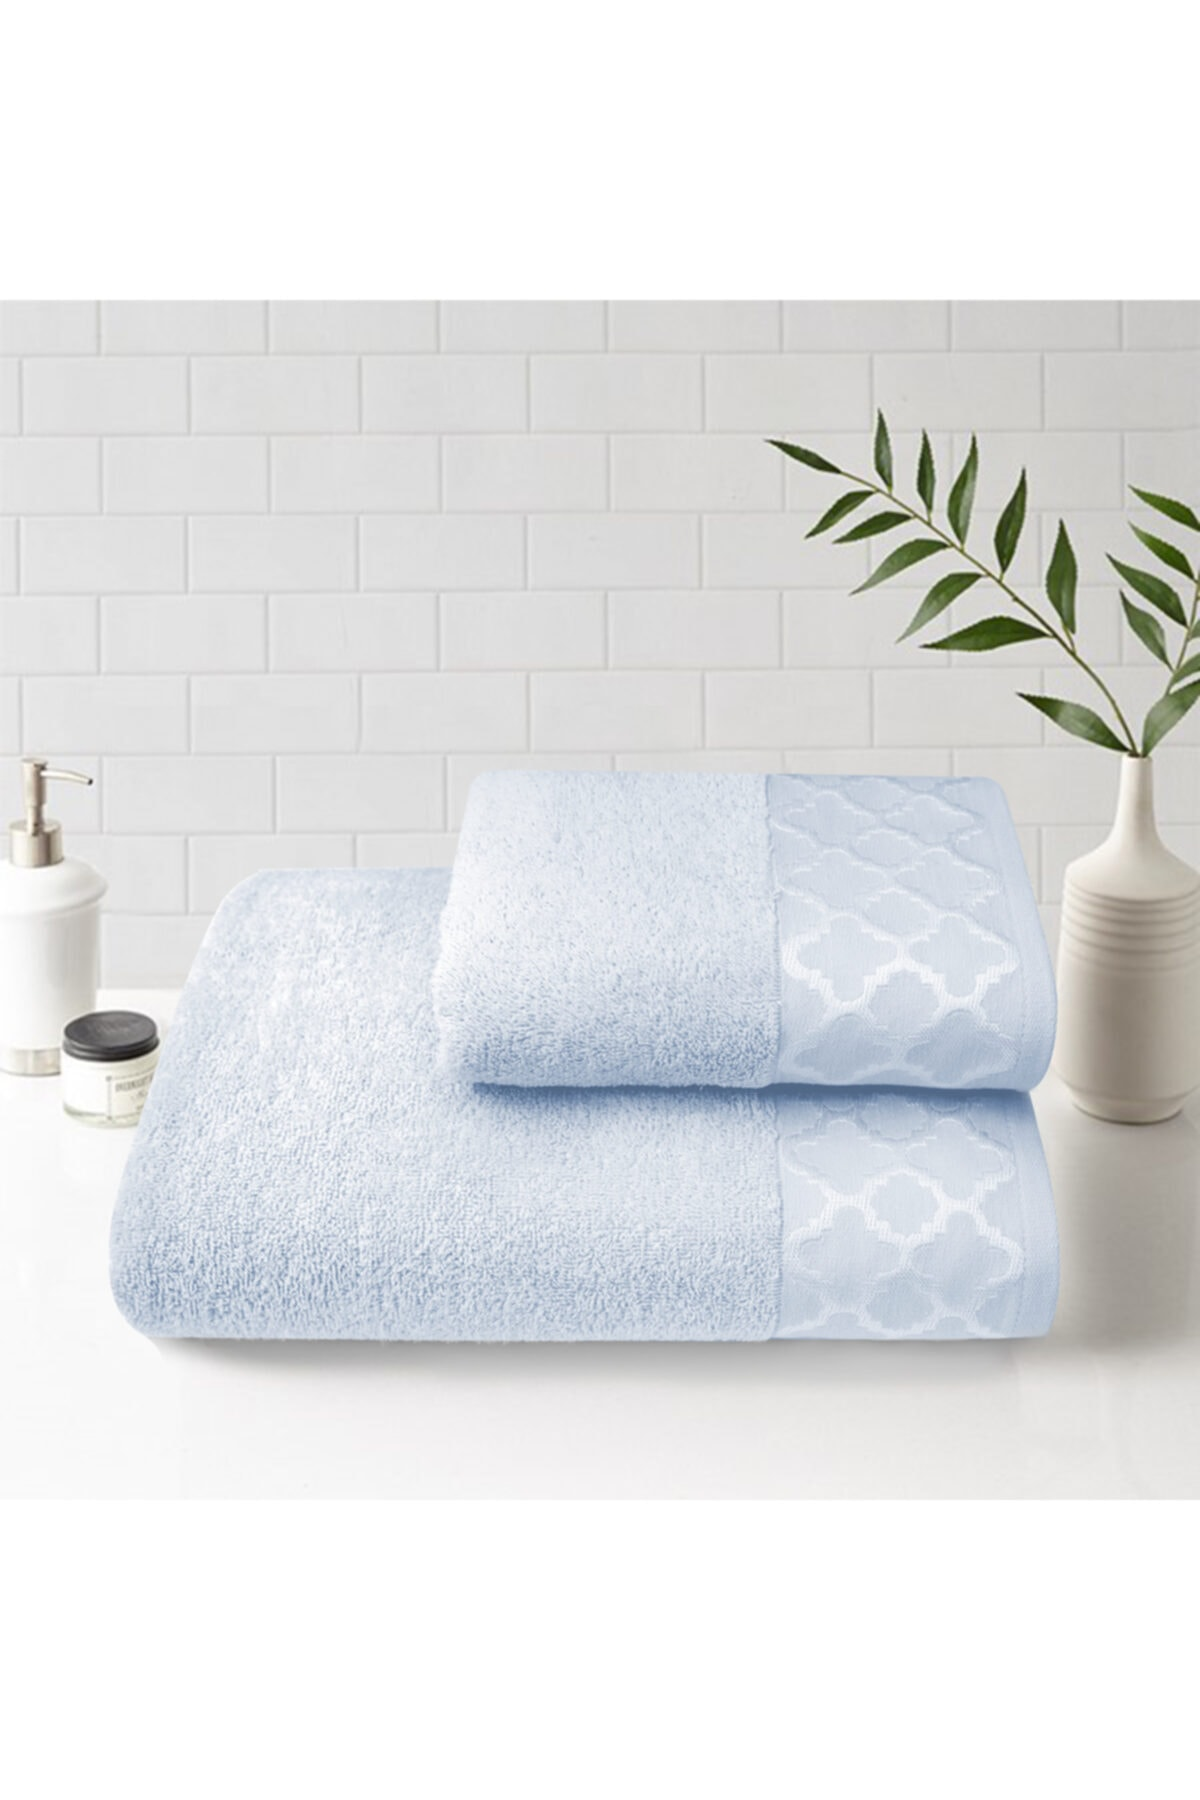 2'li Bath Towel Set, Elegant Modern Dowries Towel Set; large 140x70cm Small 90x50cm